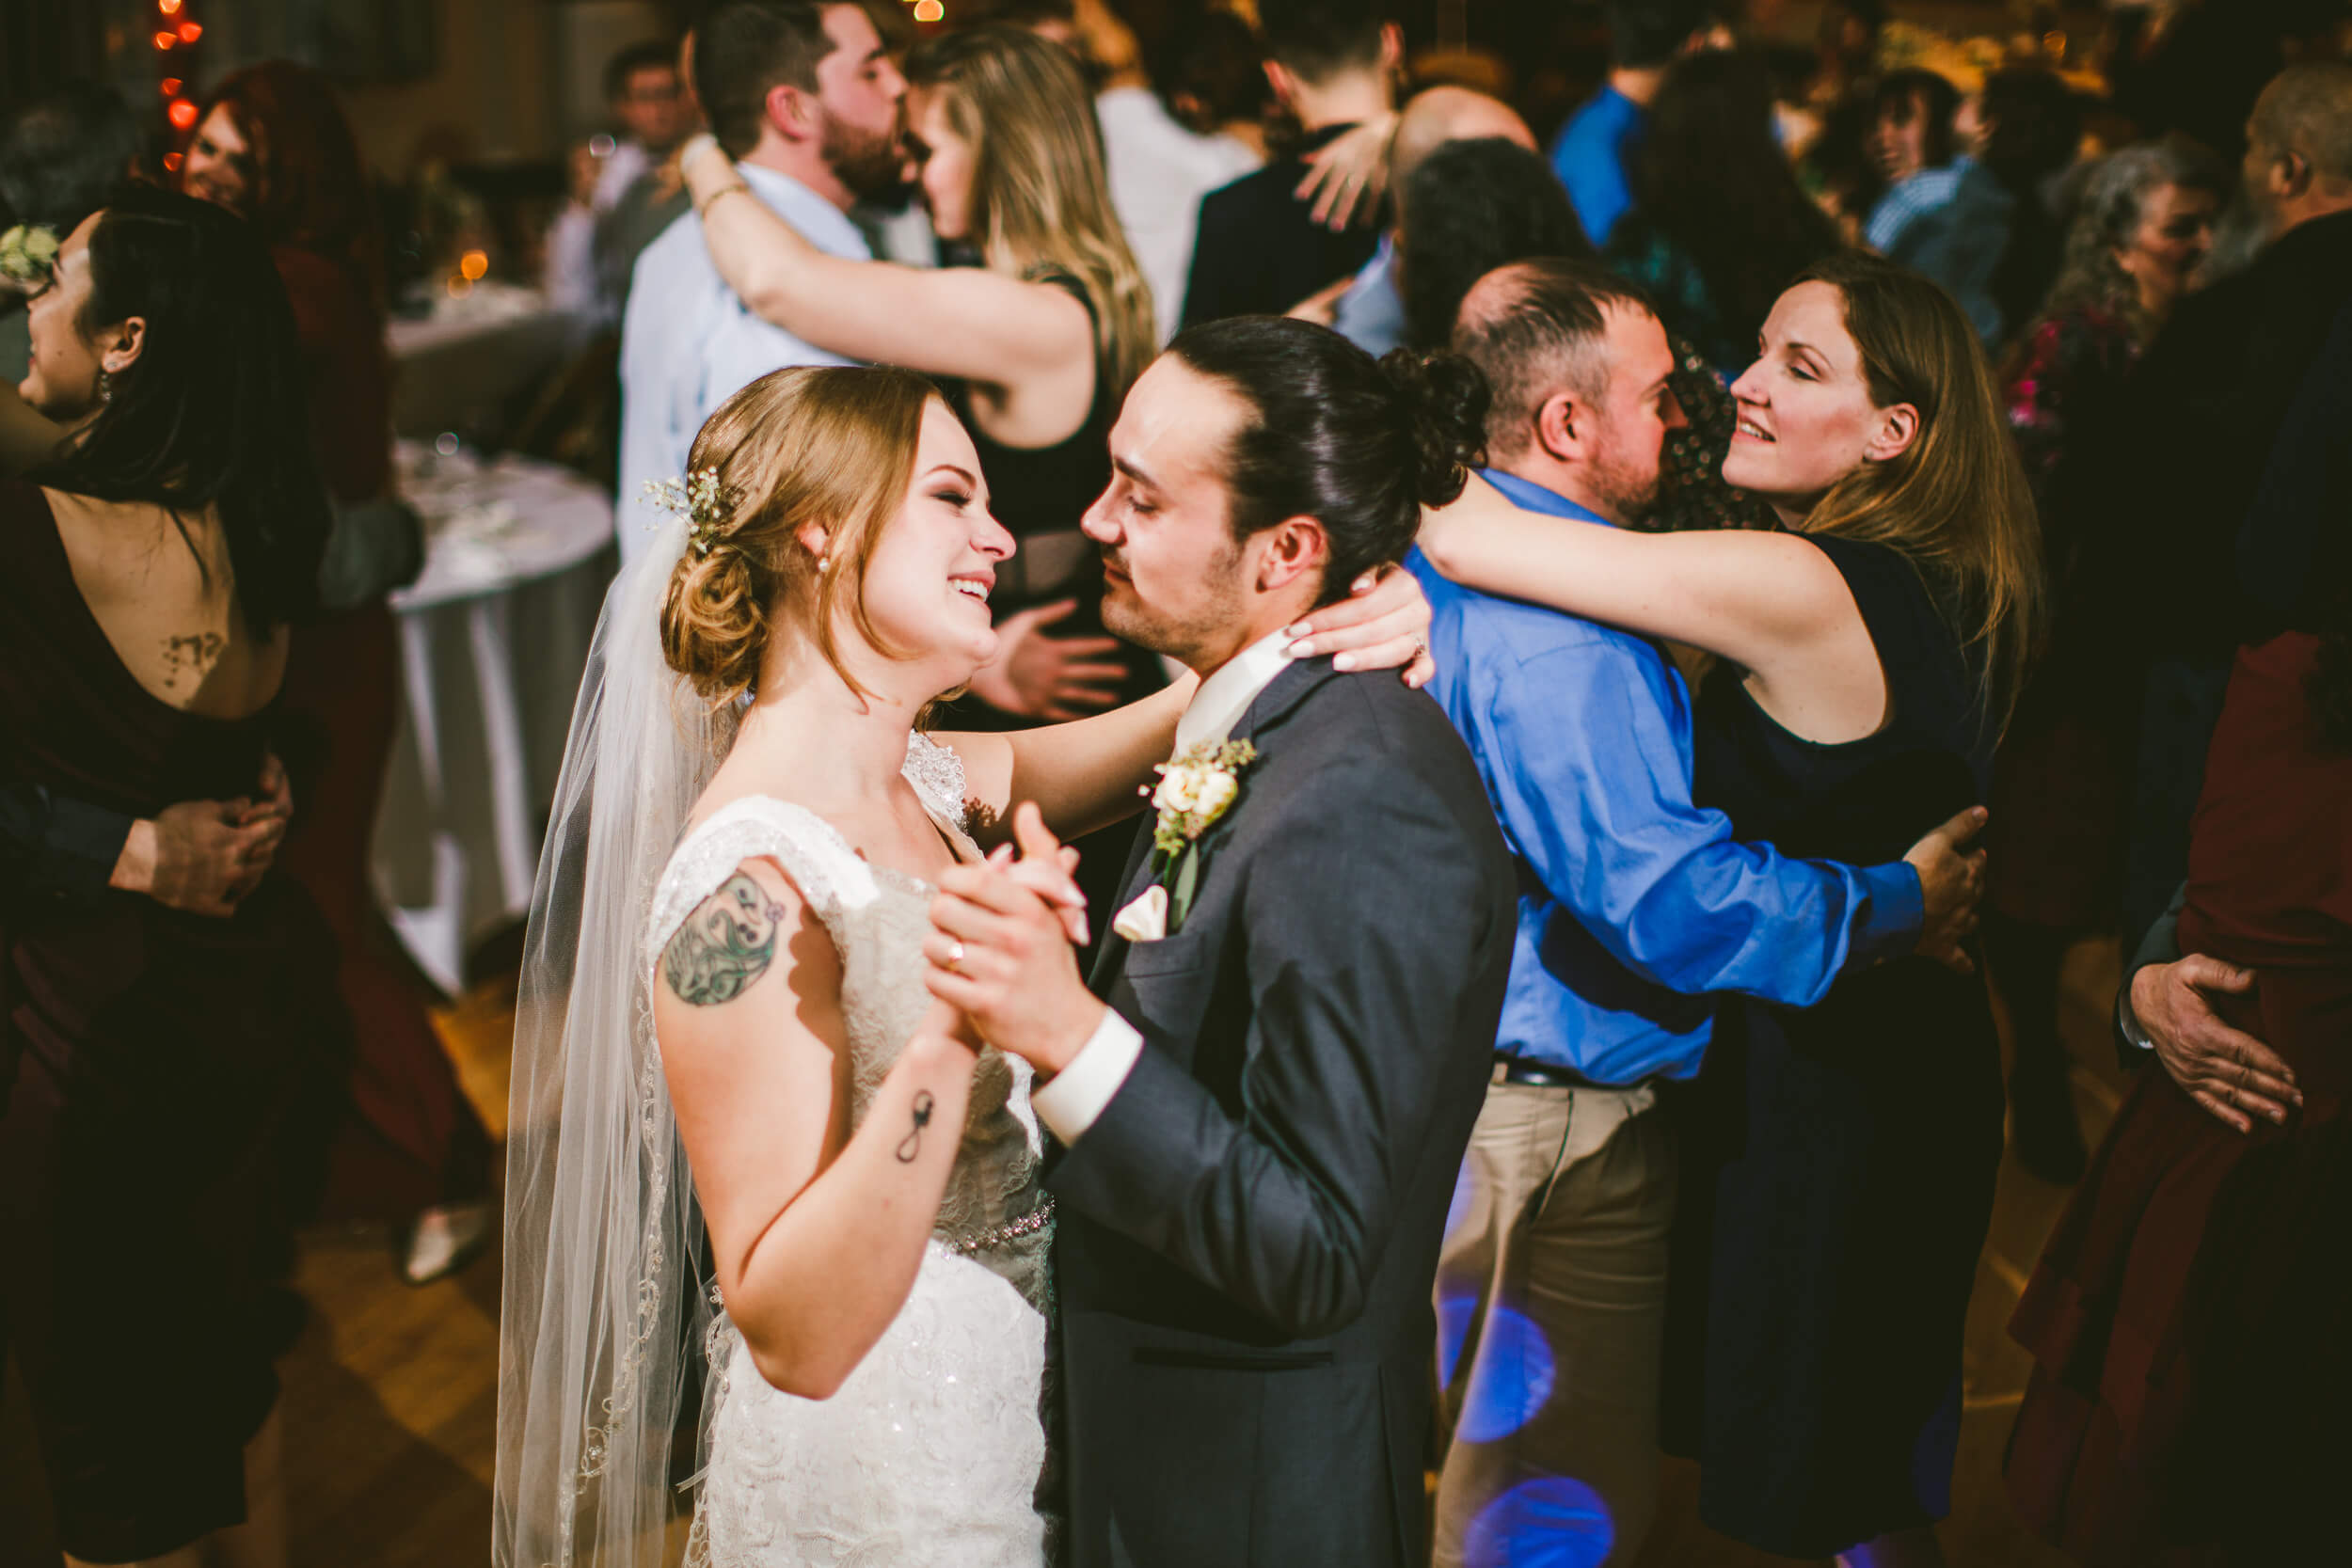 mukogawa winter wedding in spokane (294).jpg